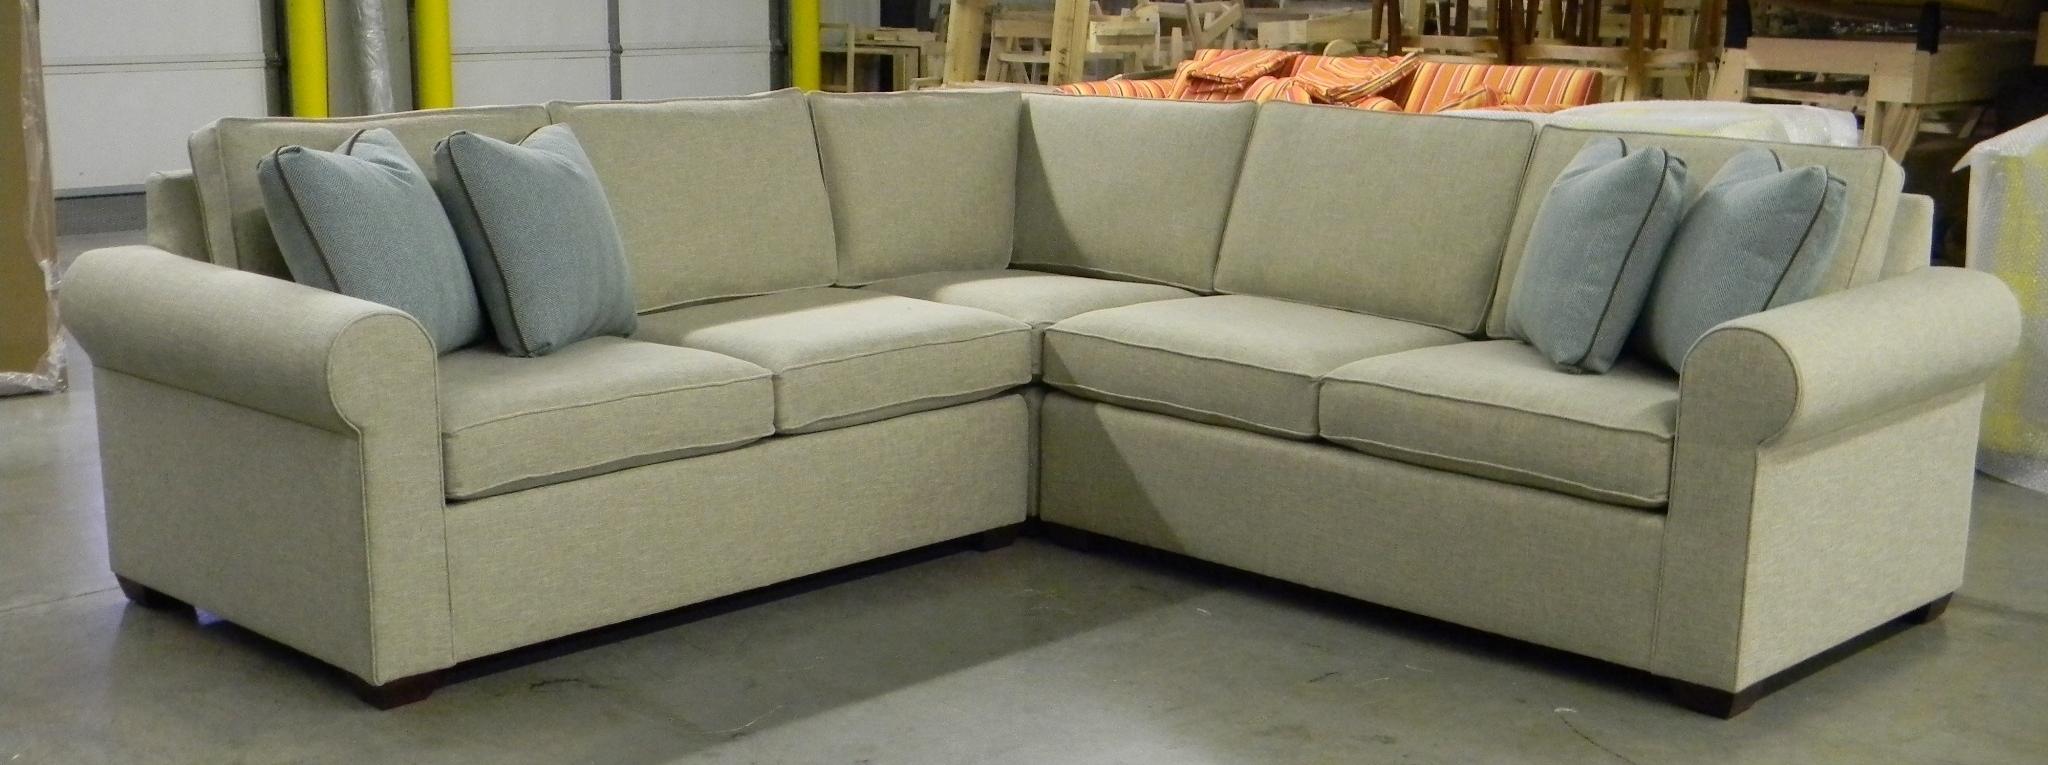 10 Ideas of Made in North Carolina Sectional Sofas Sofa Ideas